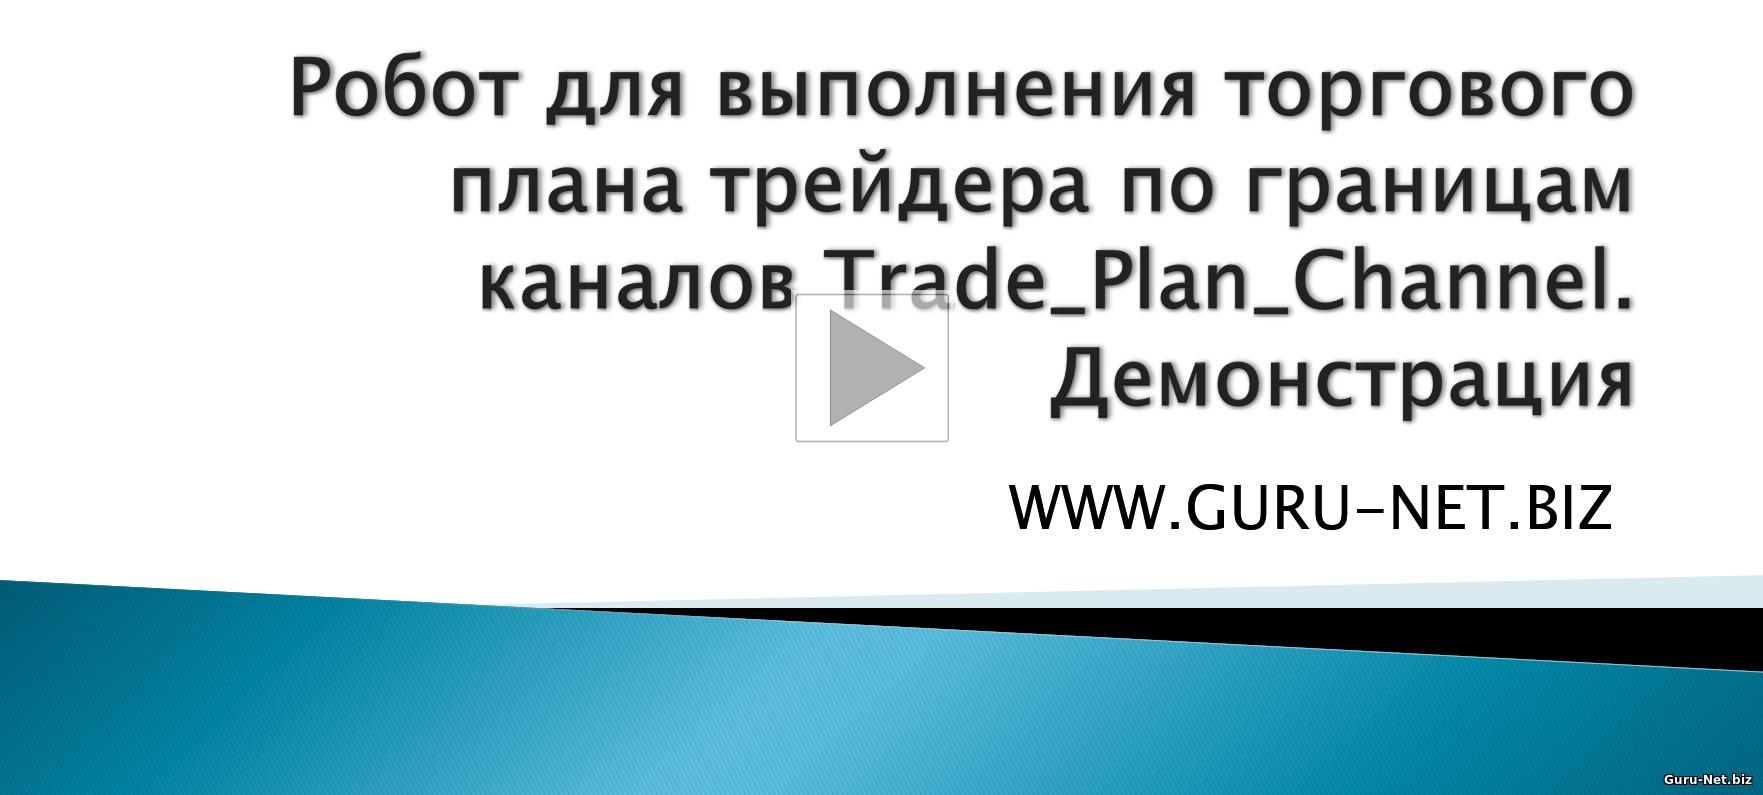 Демонстрация советник trade_plan_channel